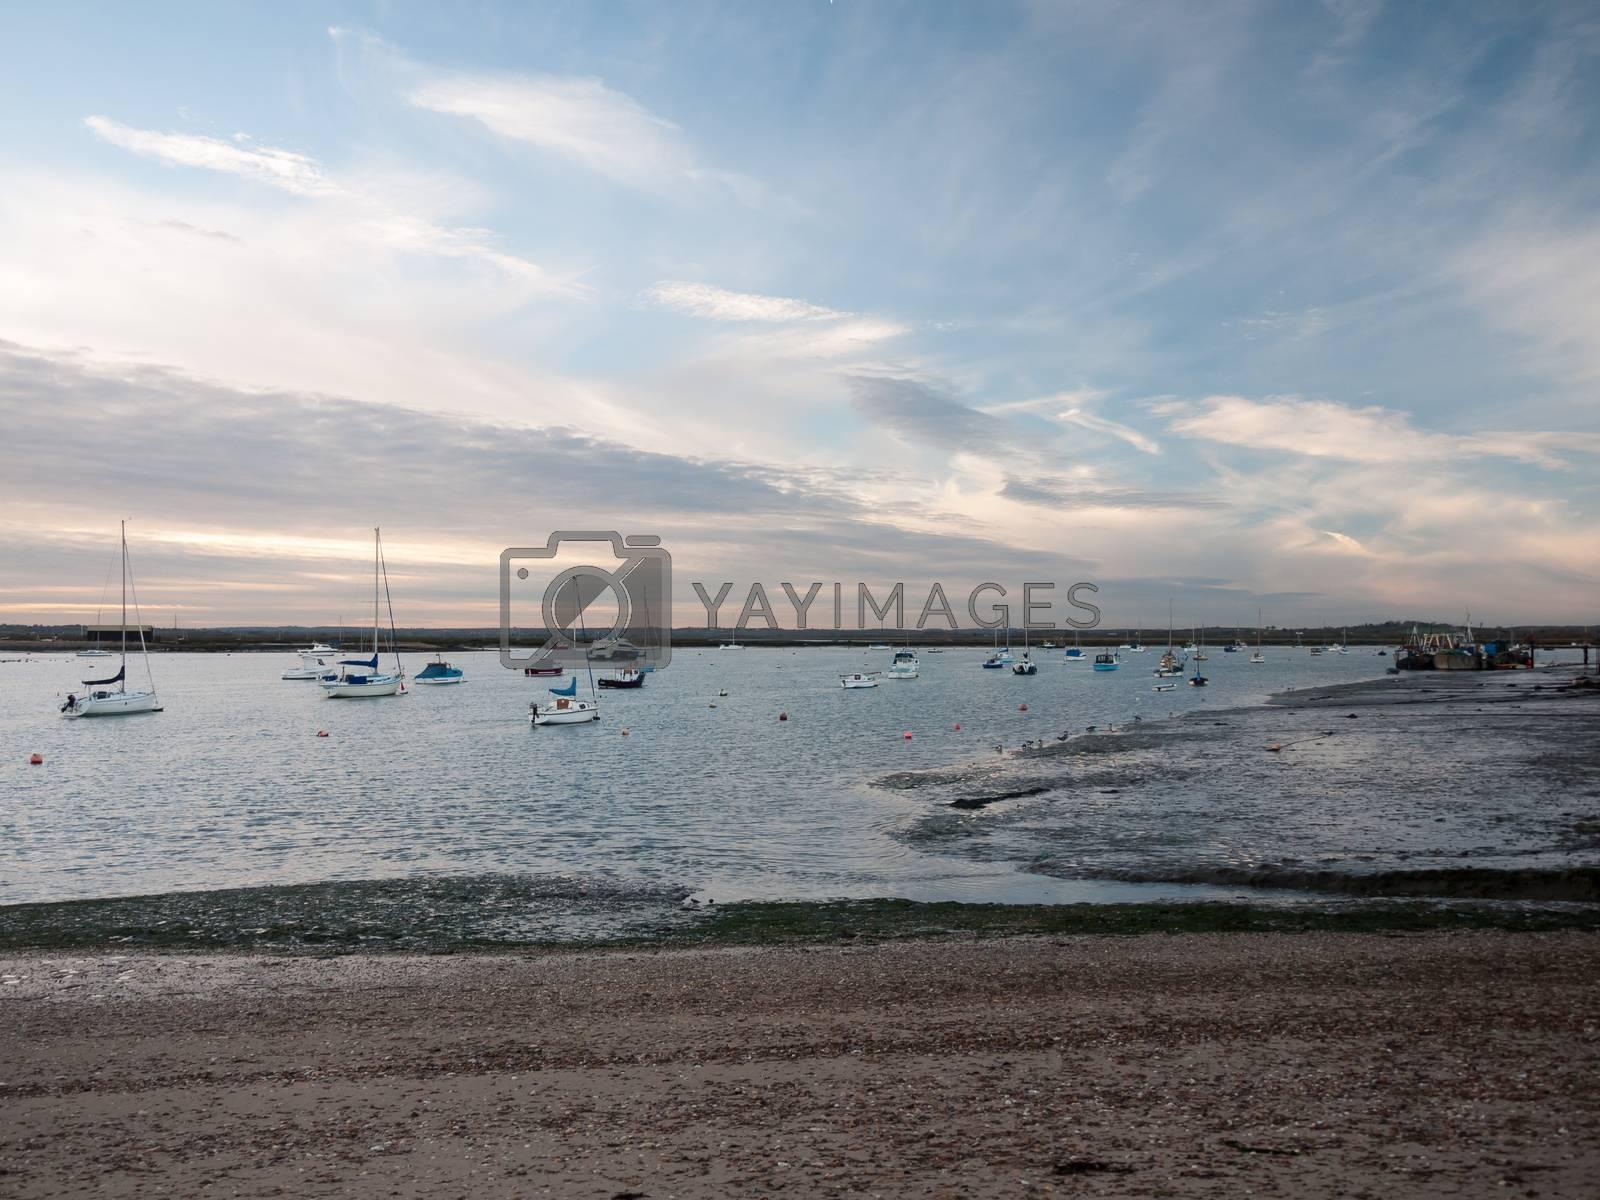 marina harbour landscape beach ocean sky with moored boats; west mersea, essex, england, uk